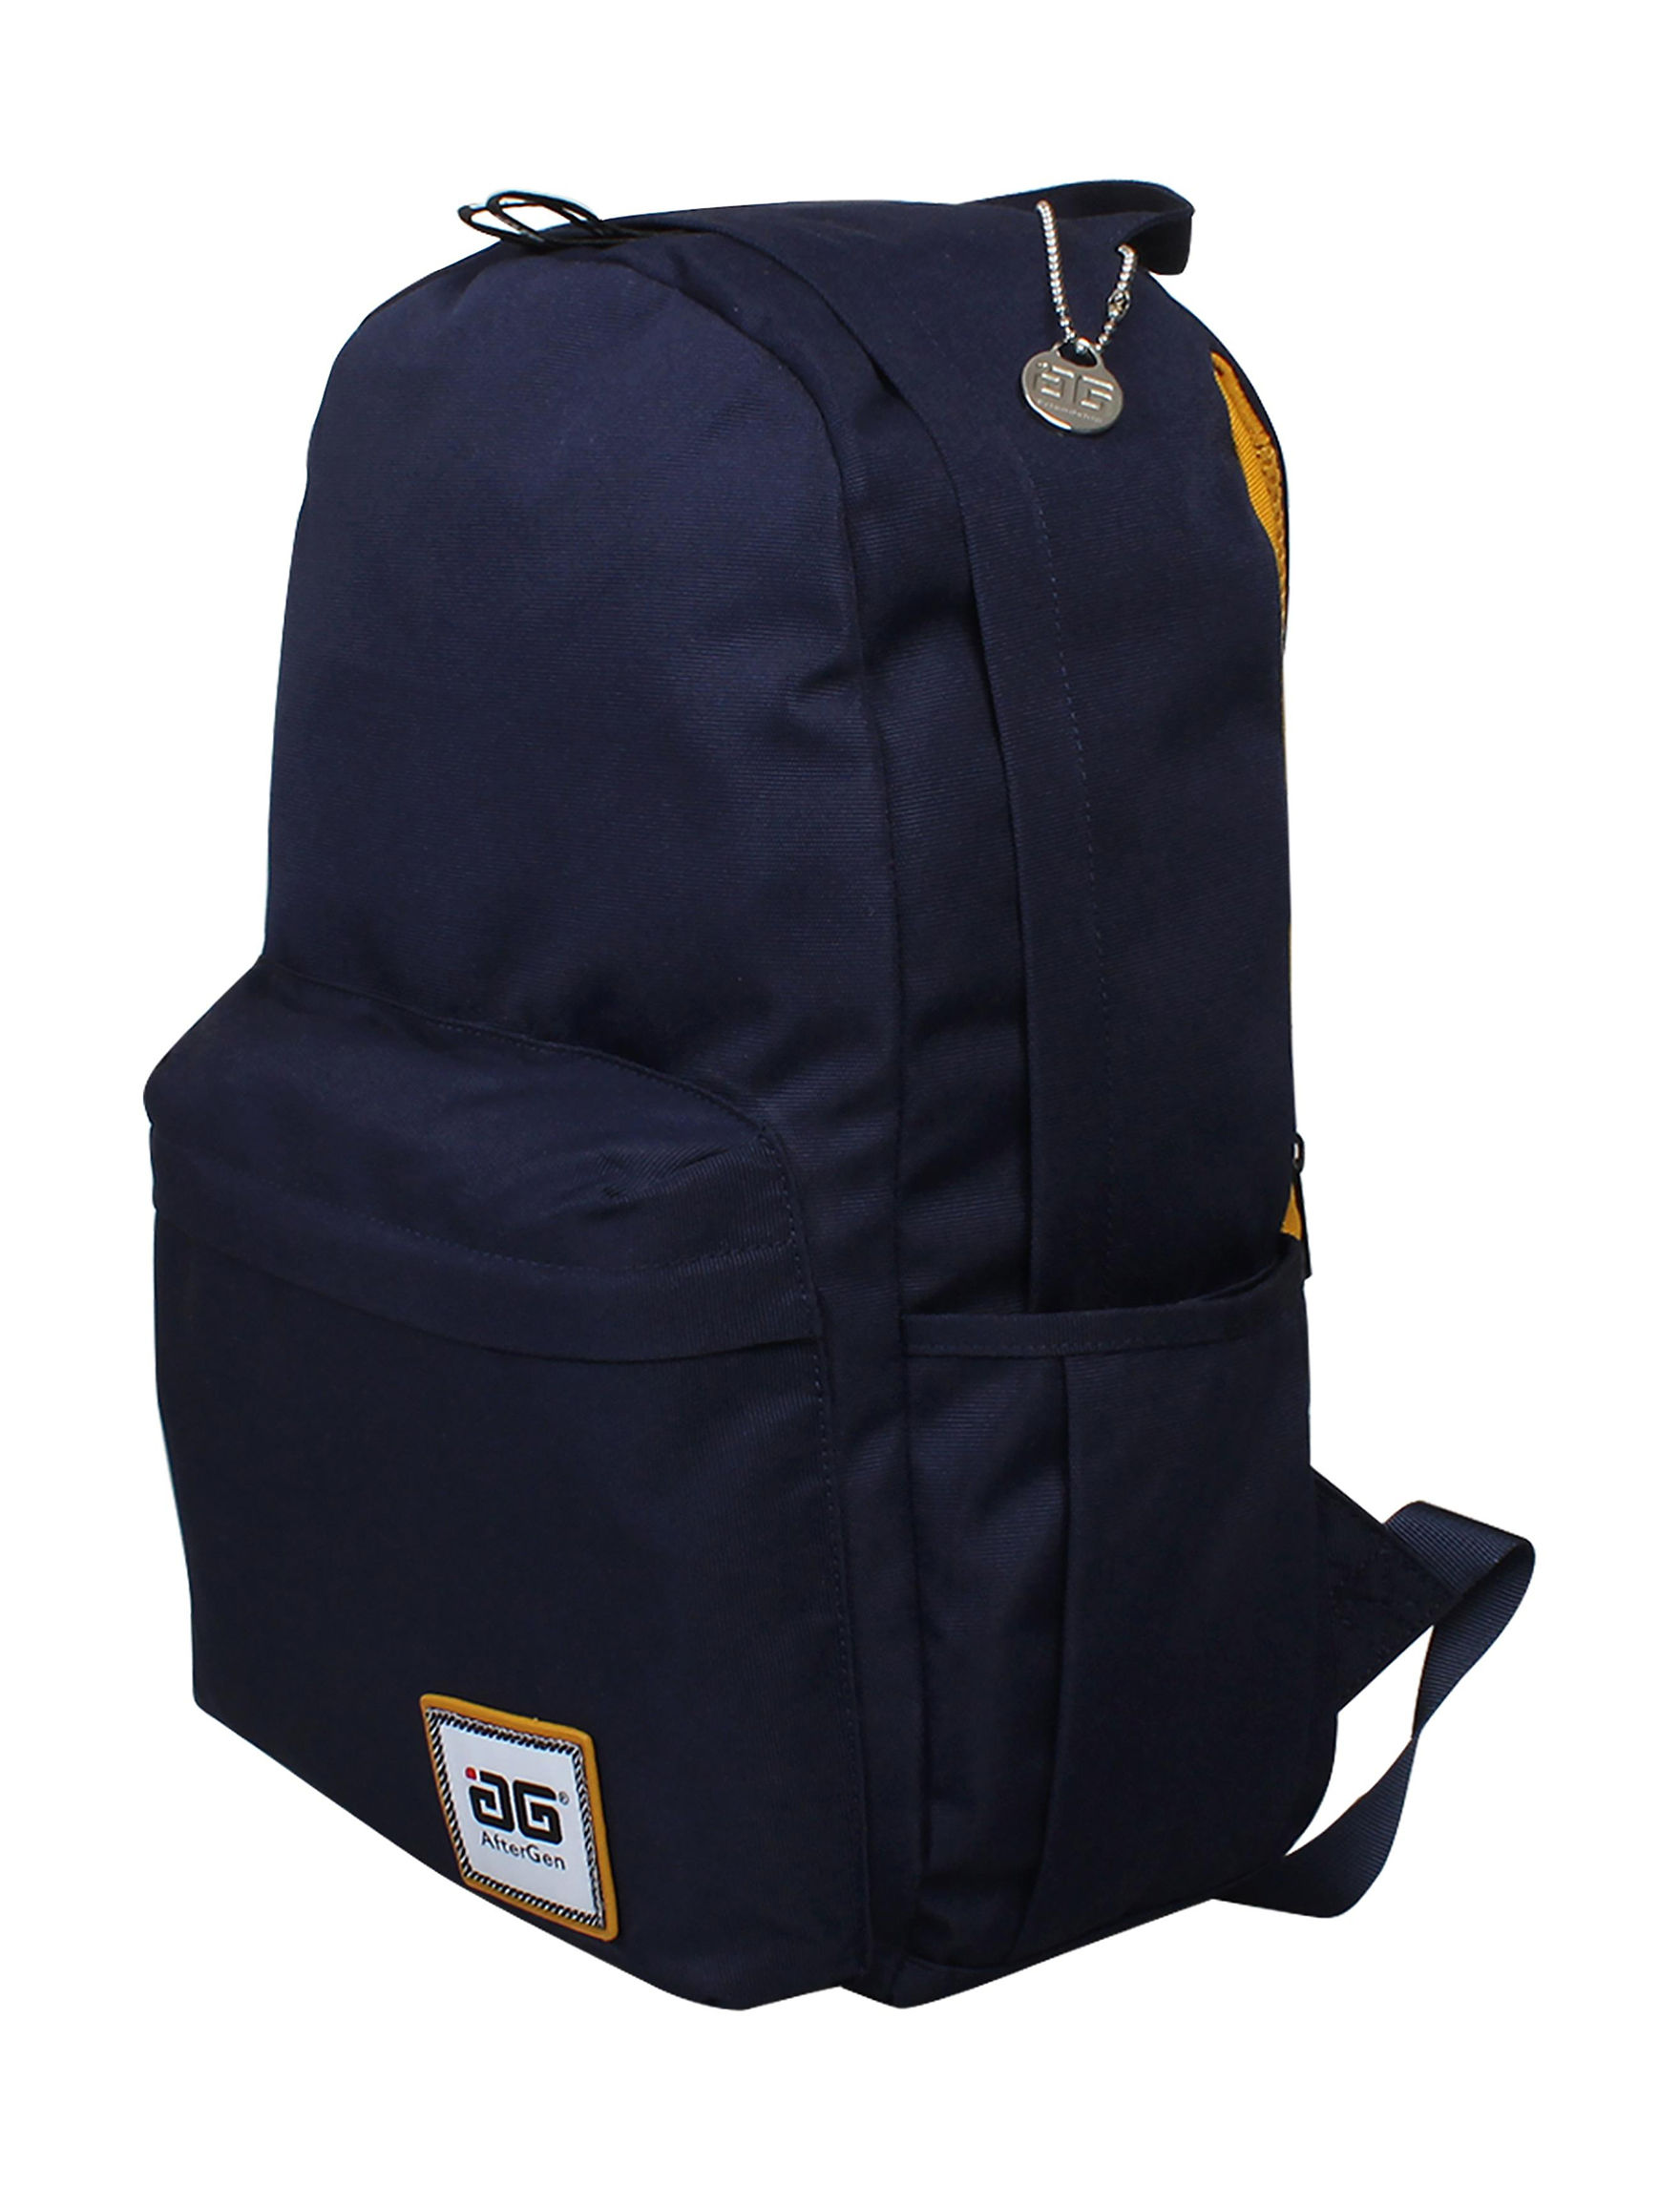 Aftergen Navy / Yellow Bookbags & Backpacks